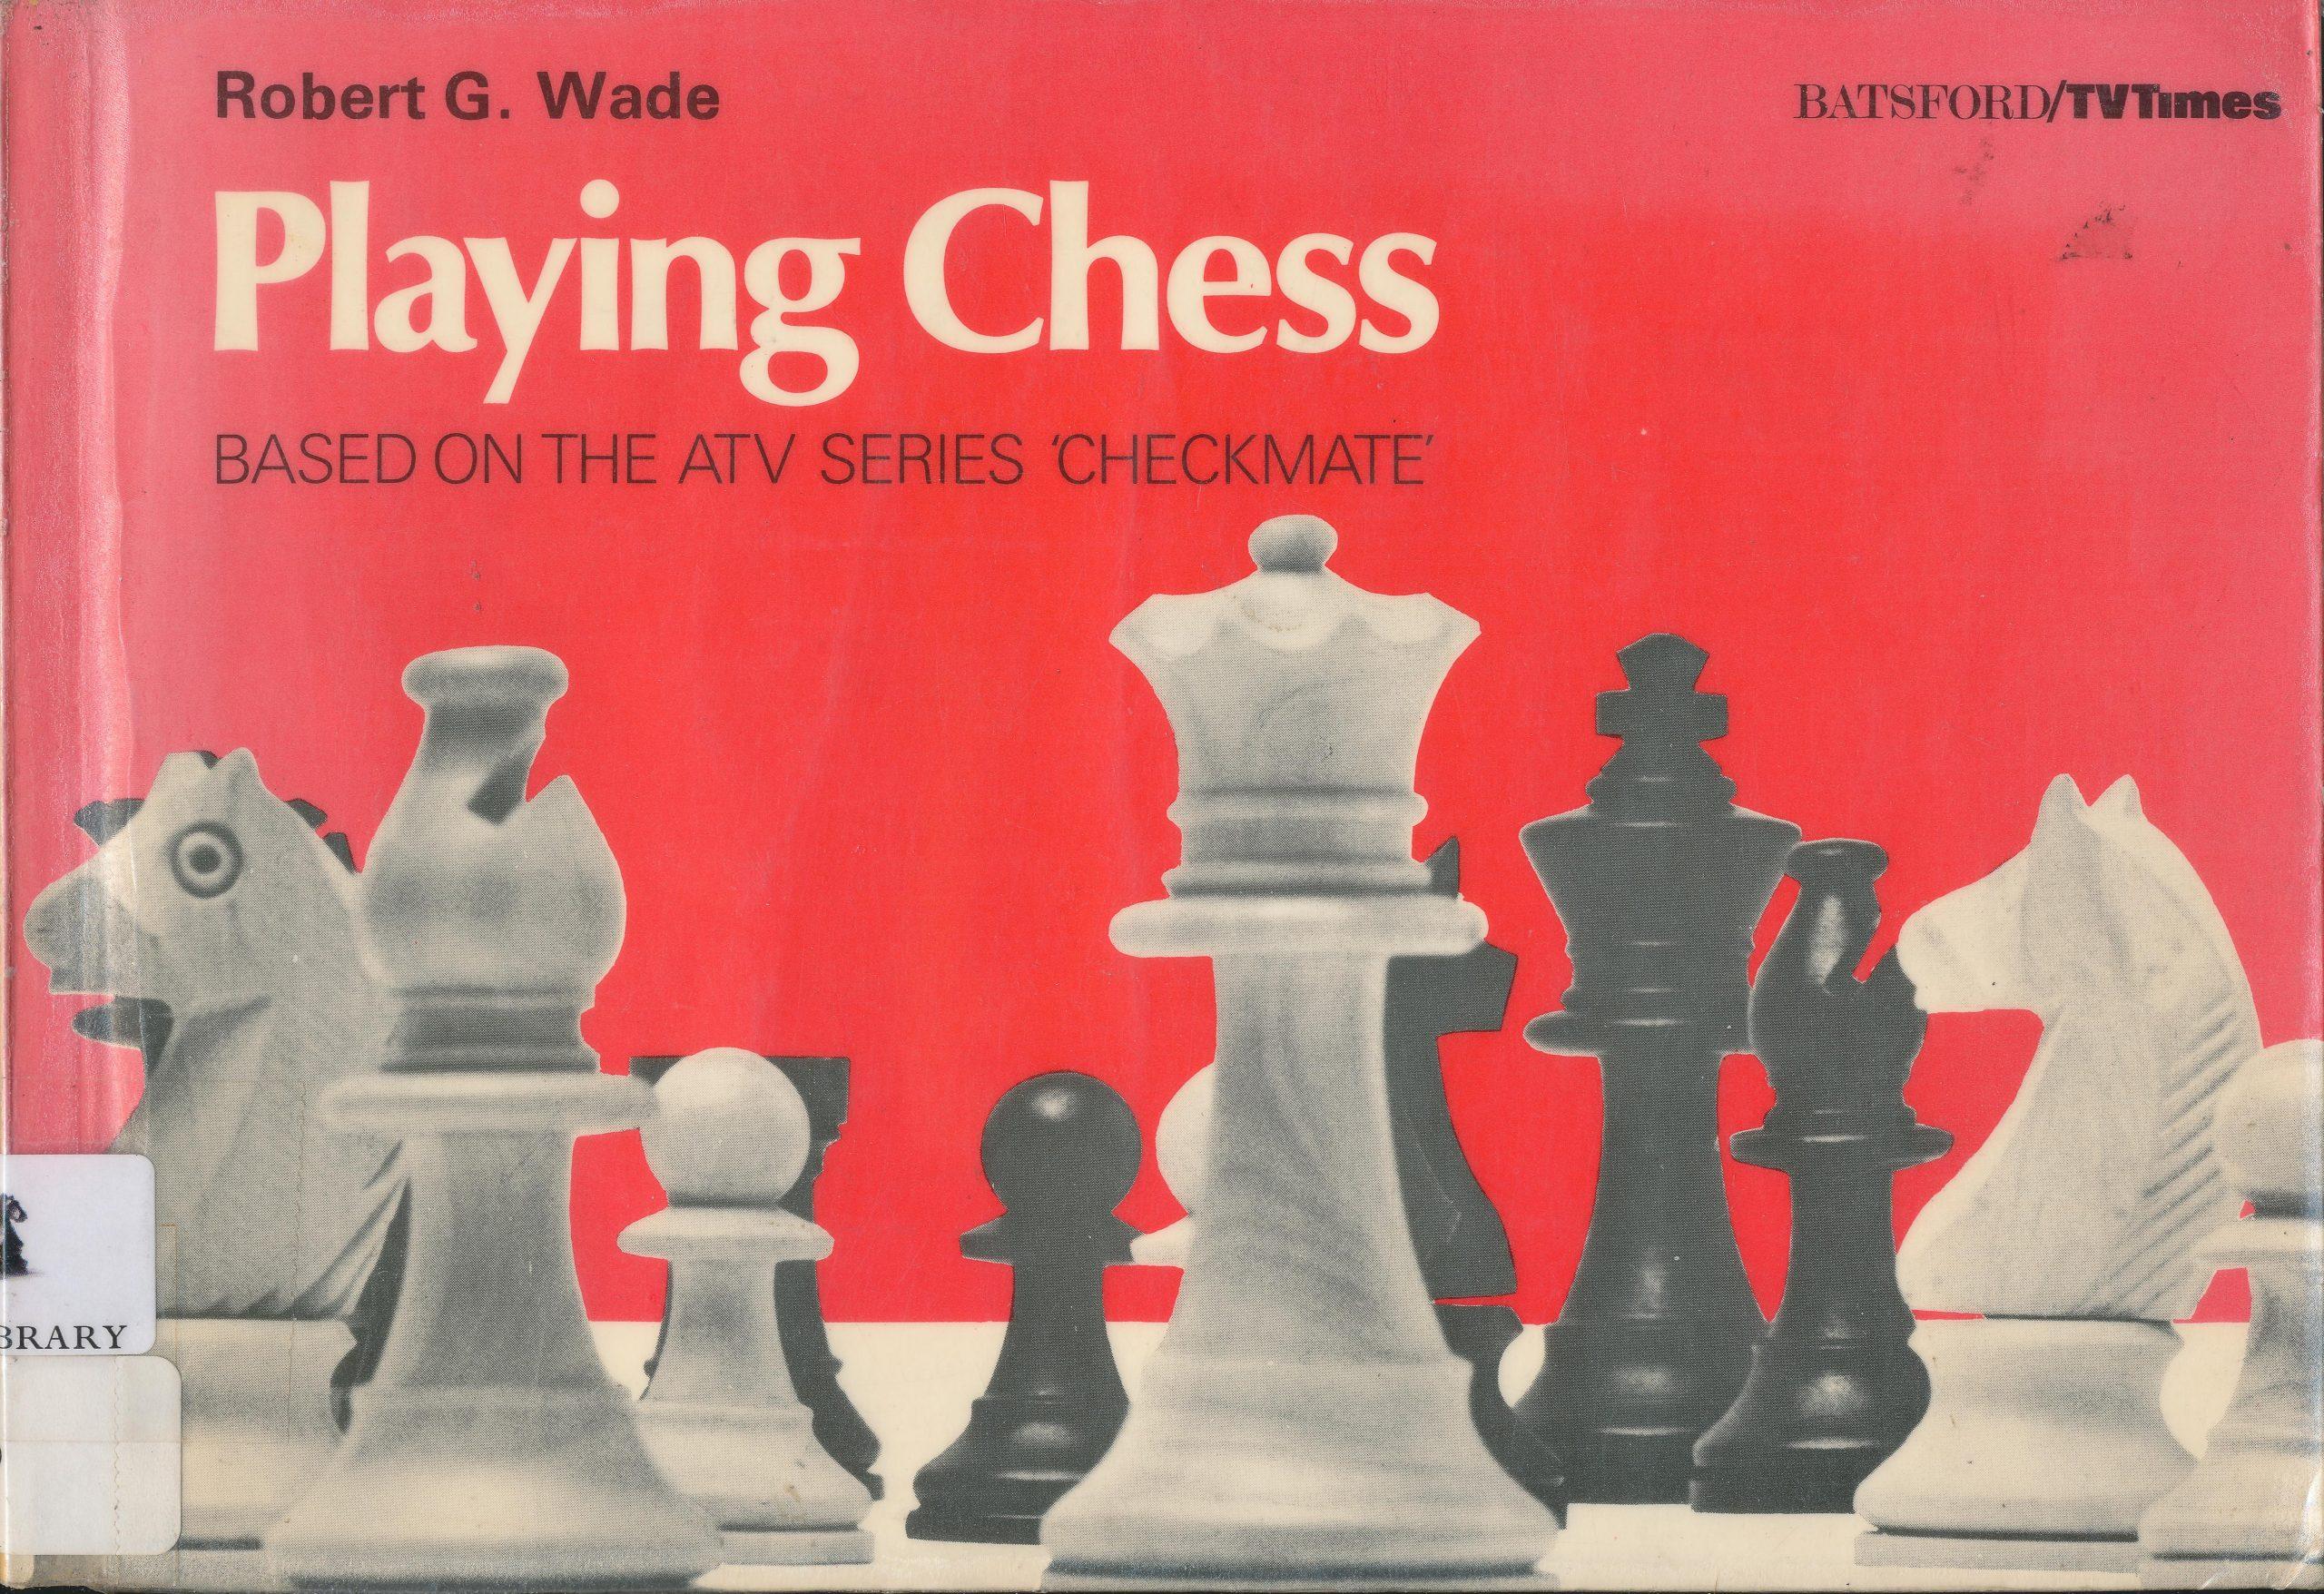 Playing Chess, RG Wade, Batsford/TVTimes, 1974